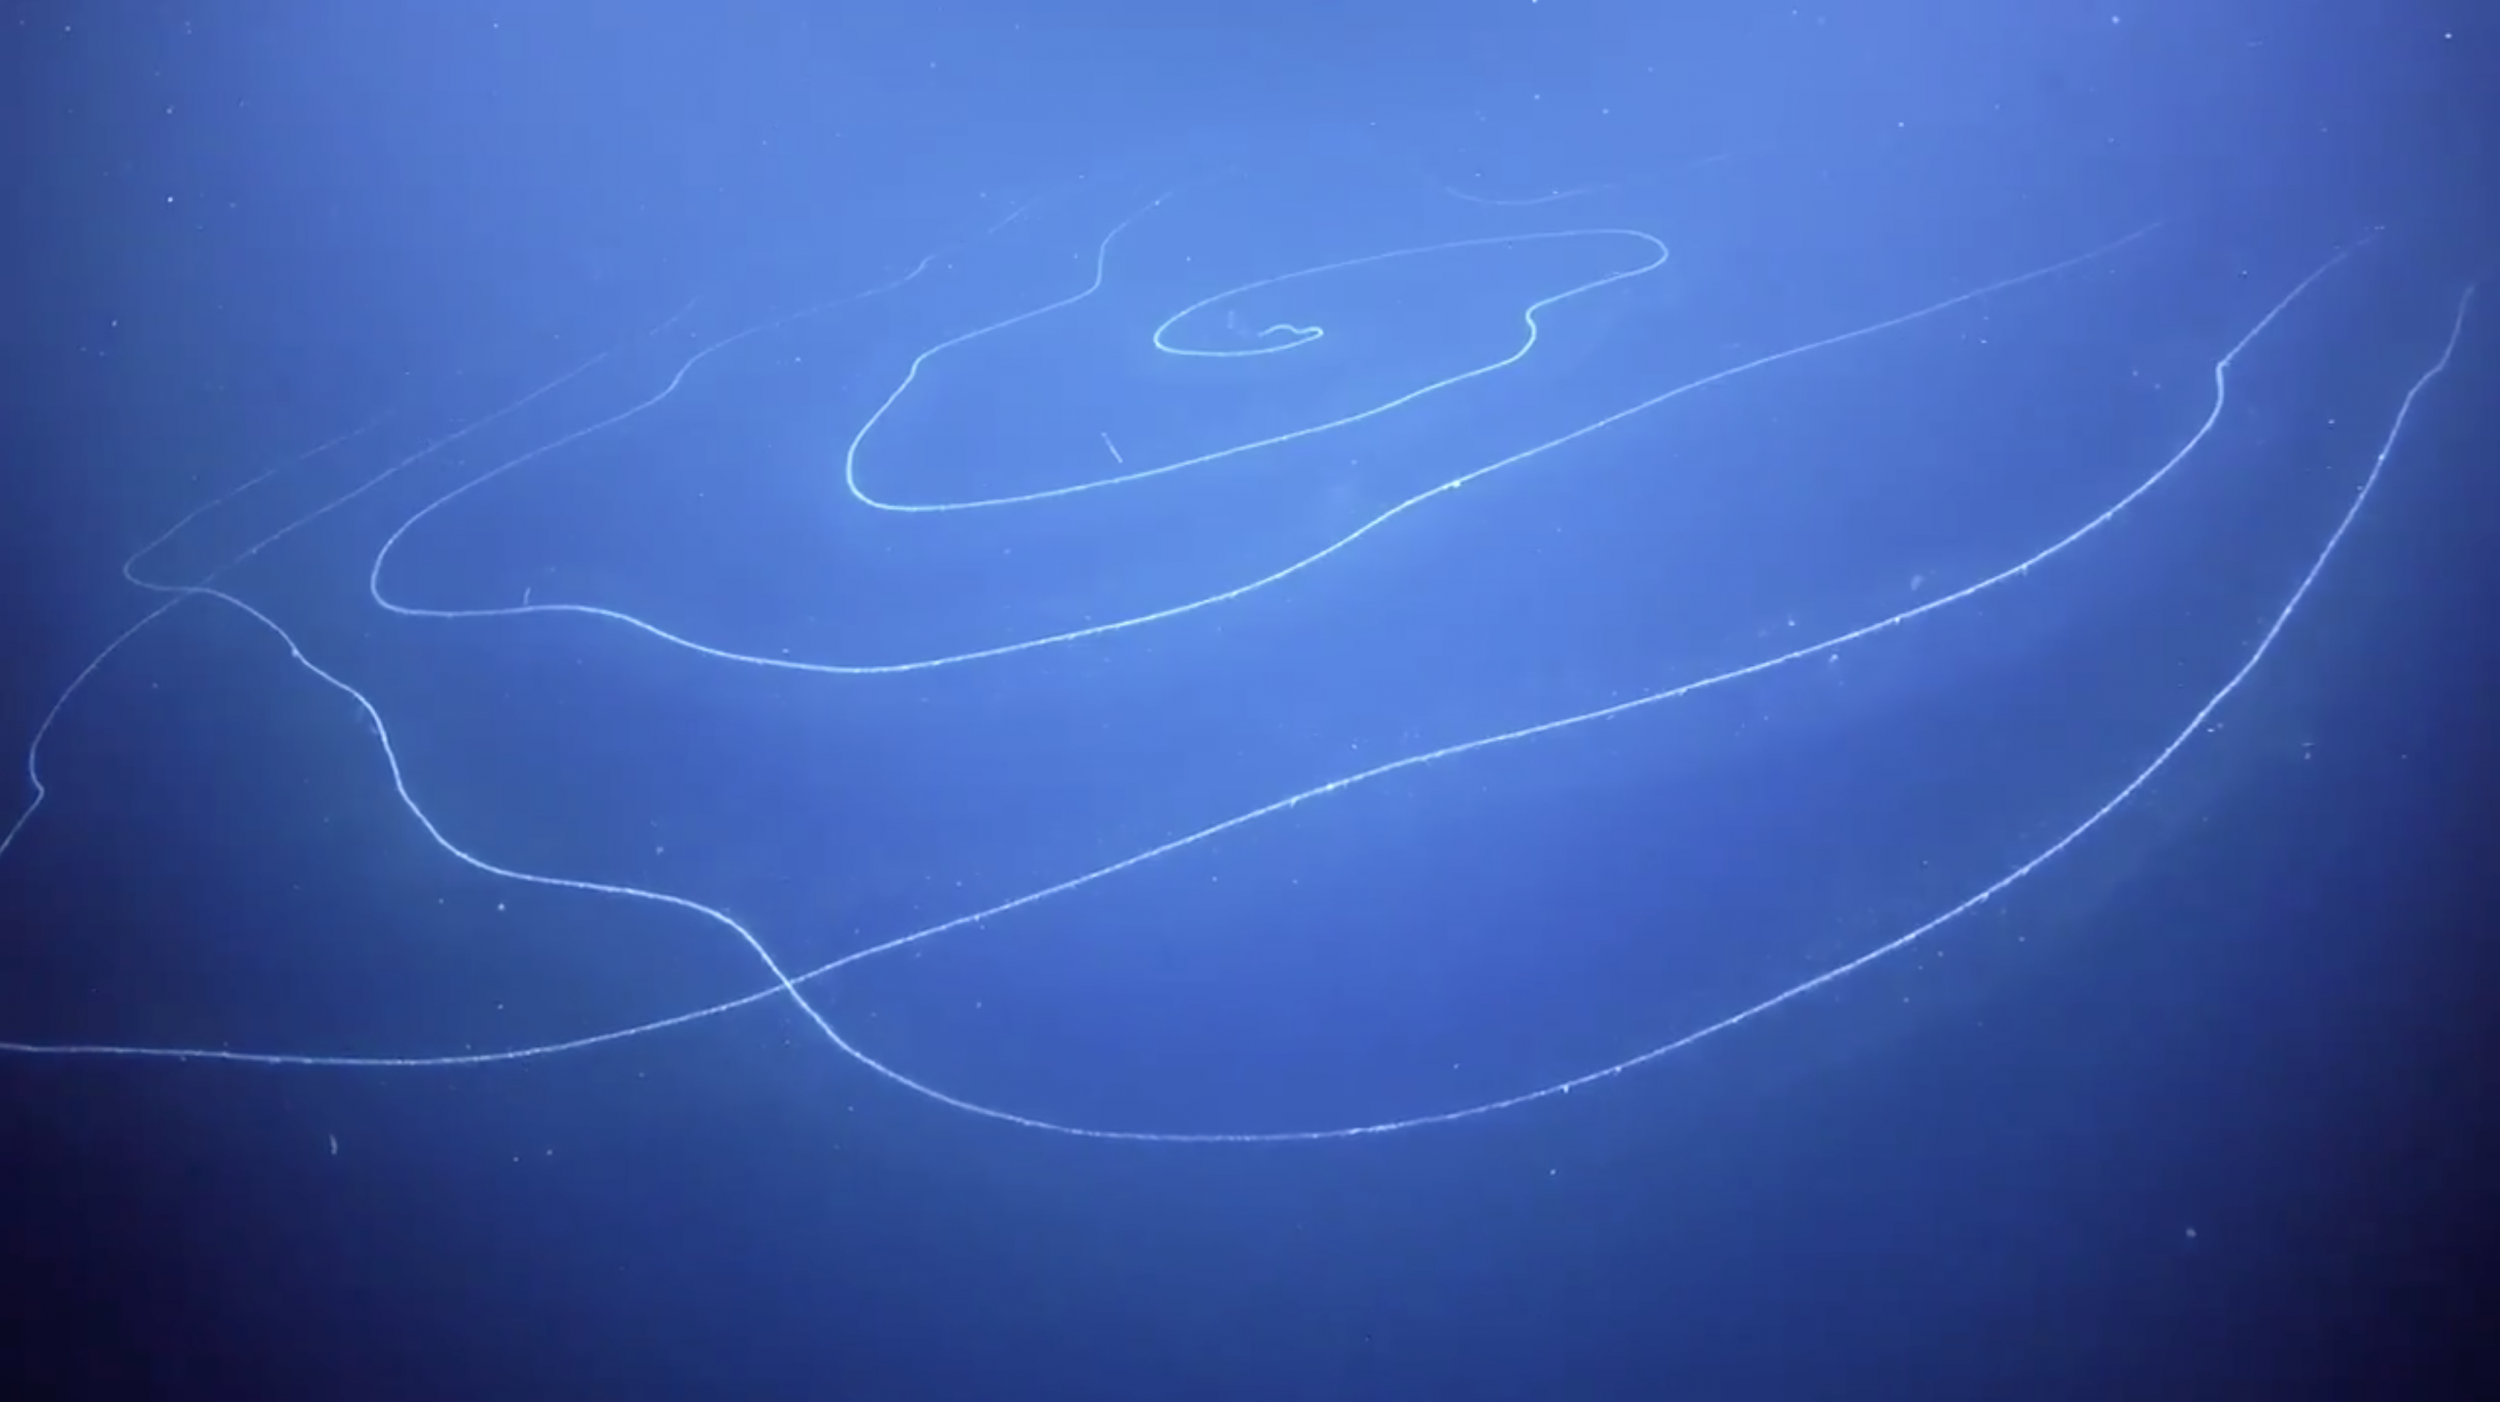 Otherworldly, 150-Foot-Long String-Like Organism Spotted in Deep Sea - Newsweek